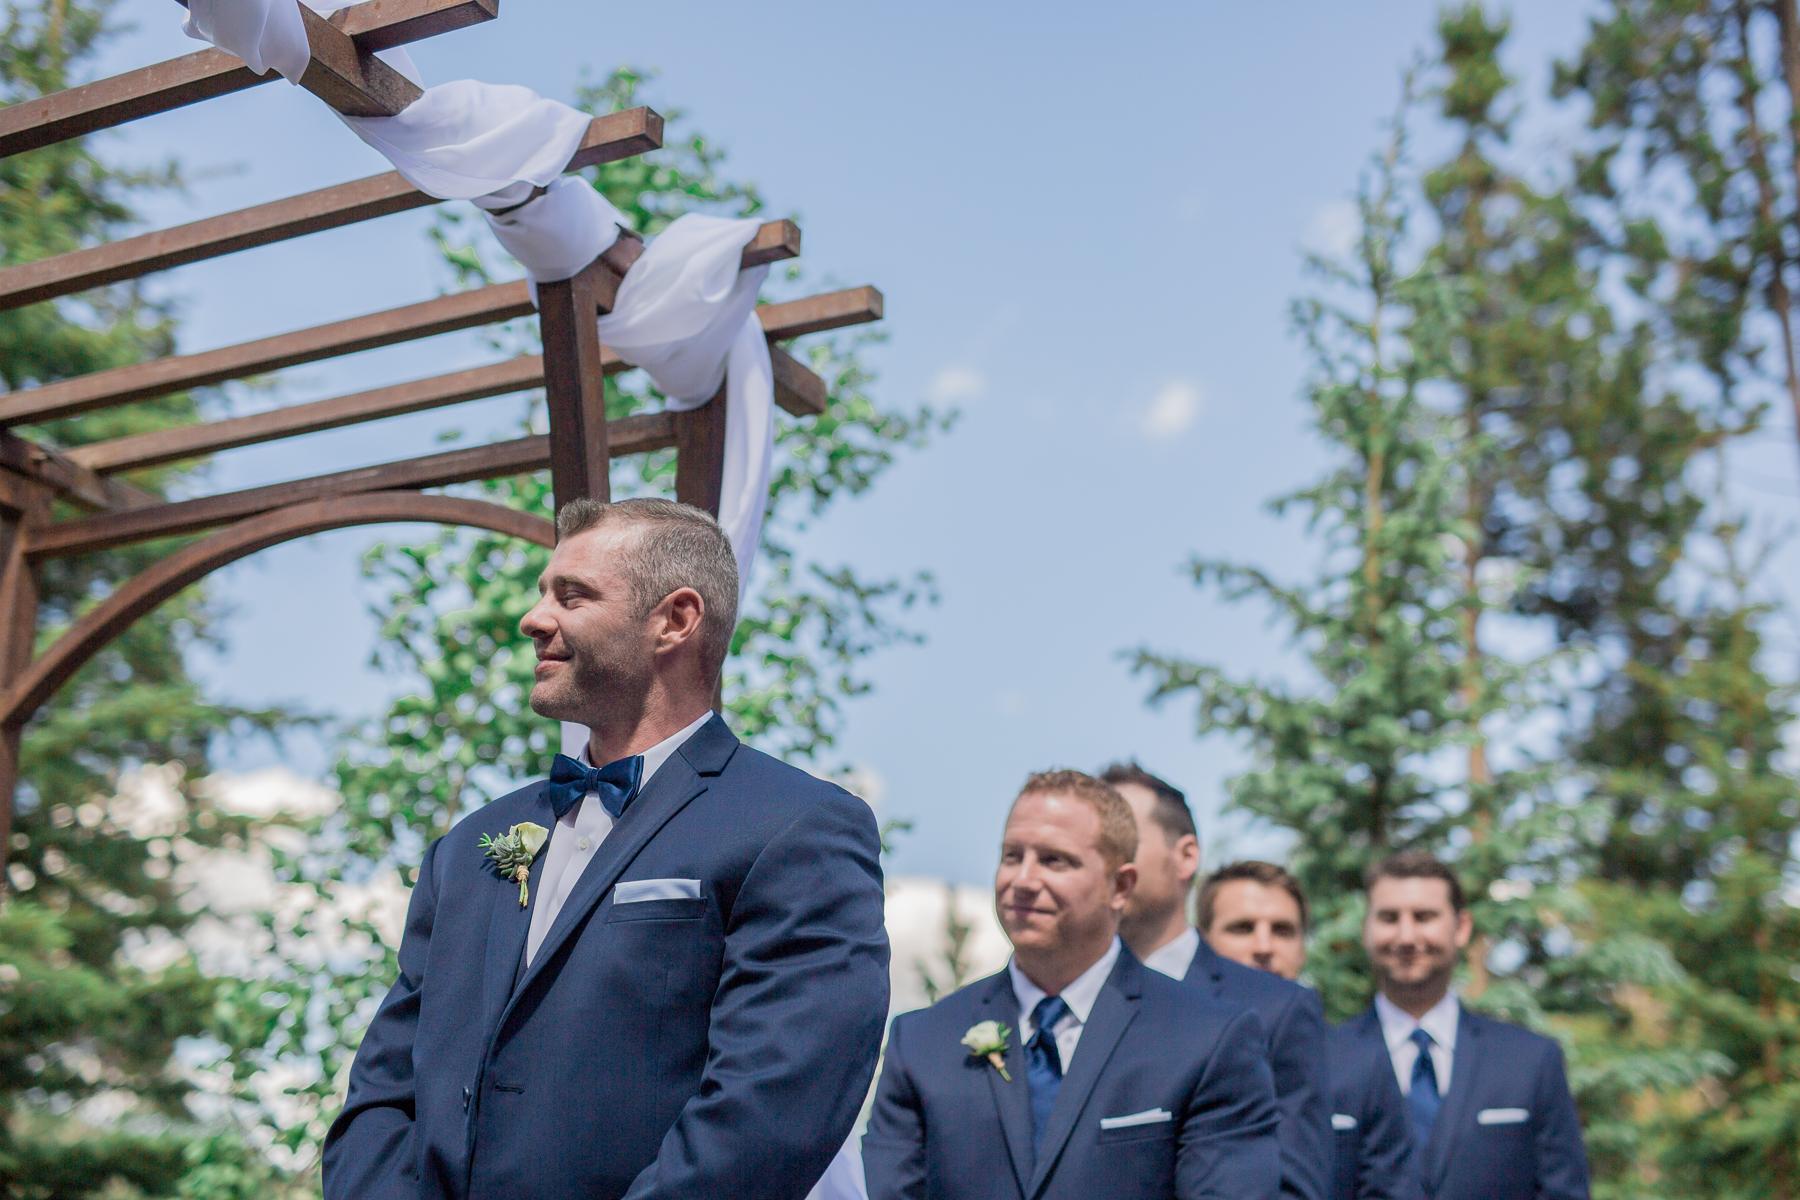 StaciDesign-Colorado-Wedding-4485.jpg